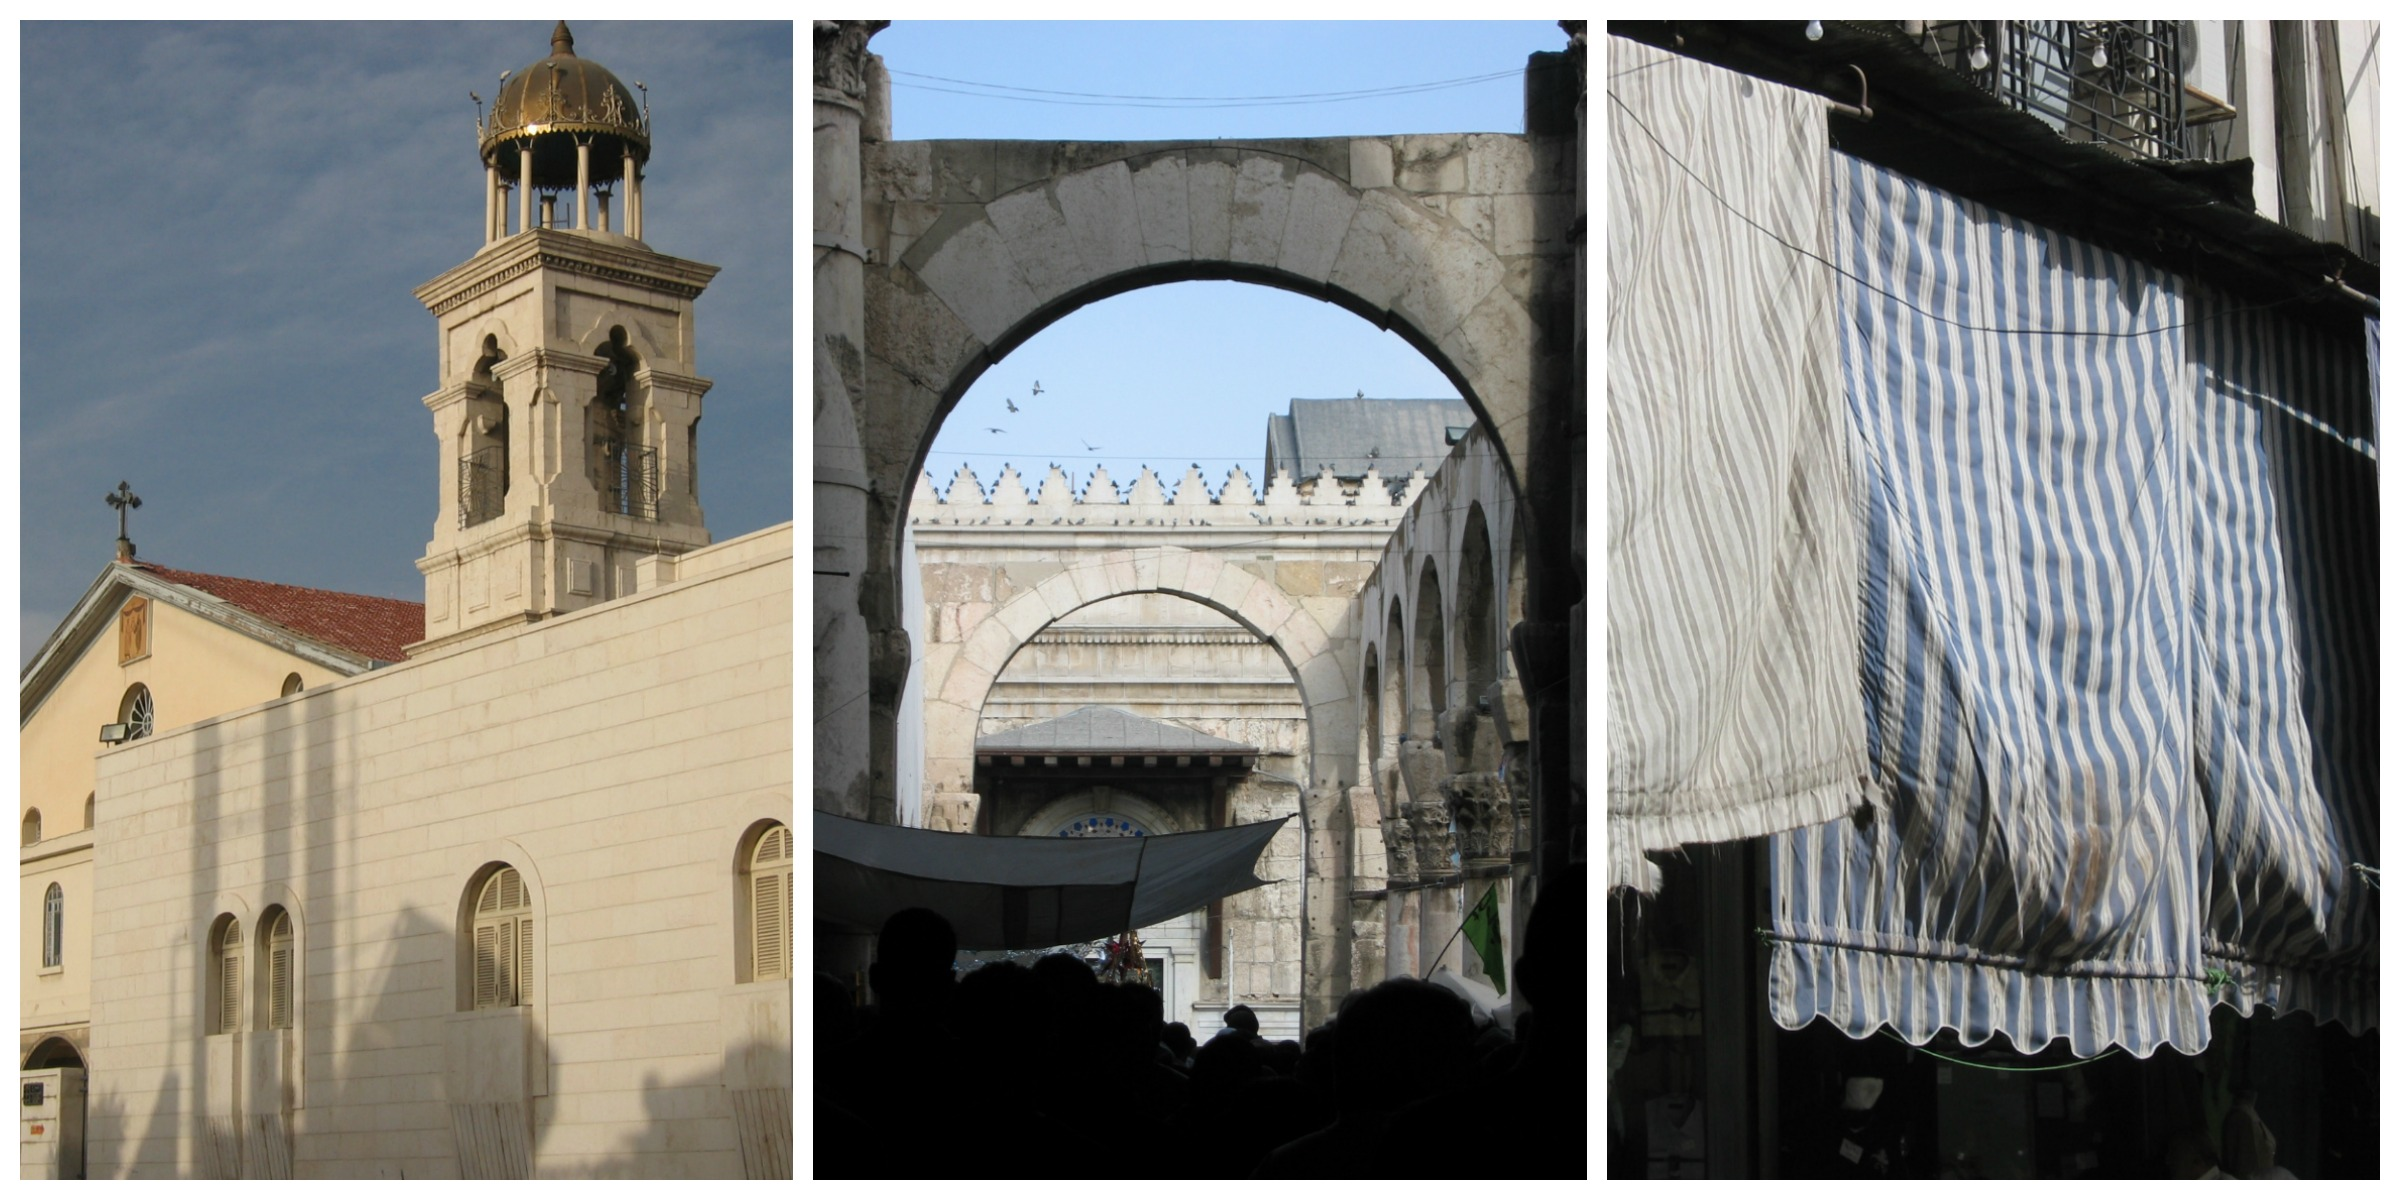 160220_Collage_Damaskus_1